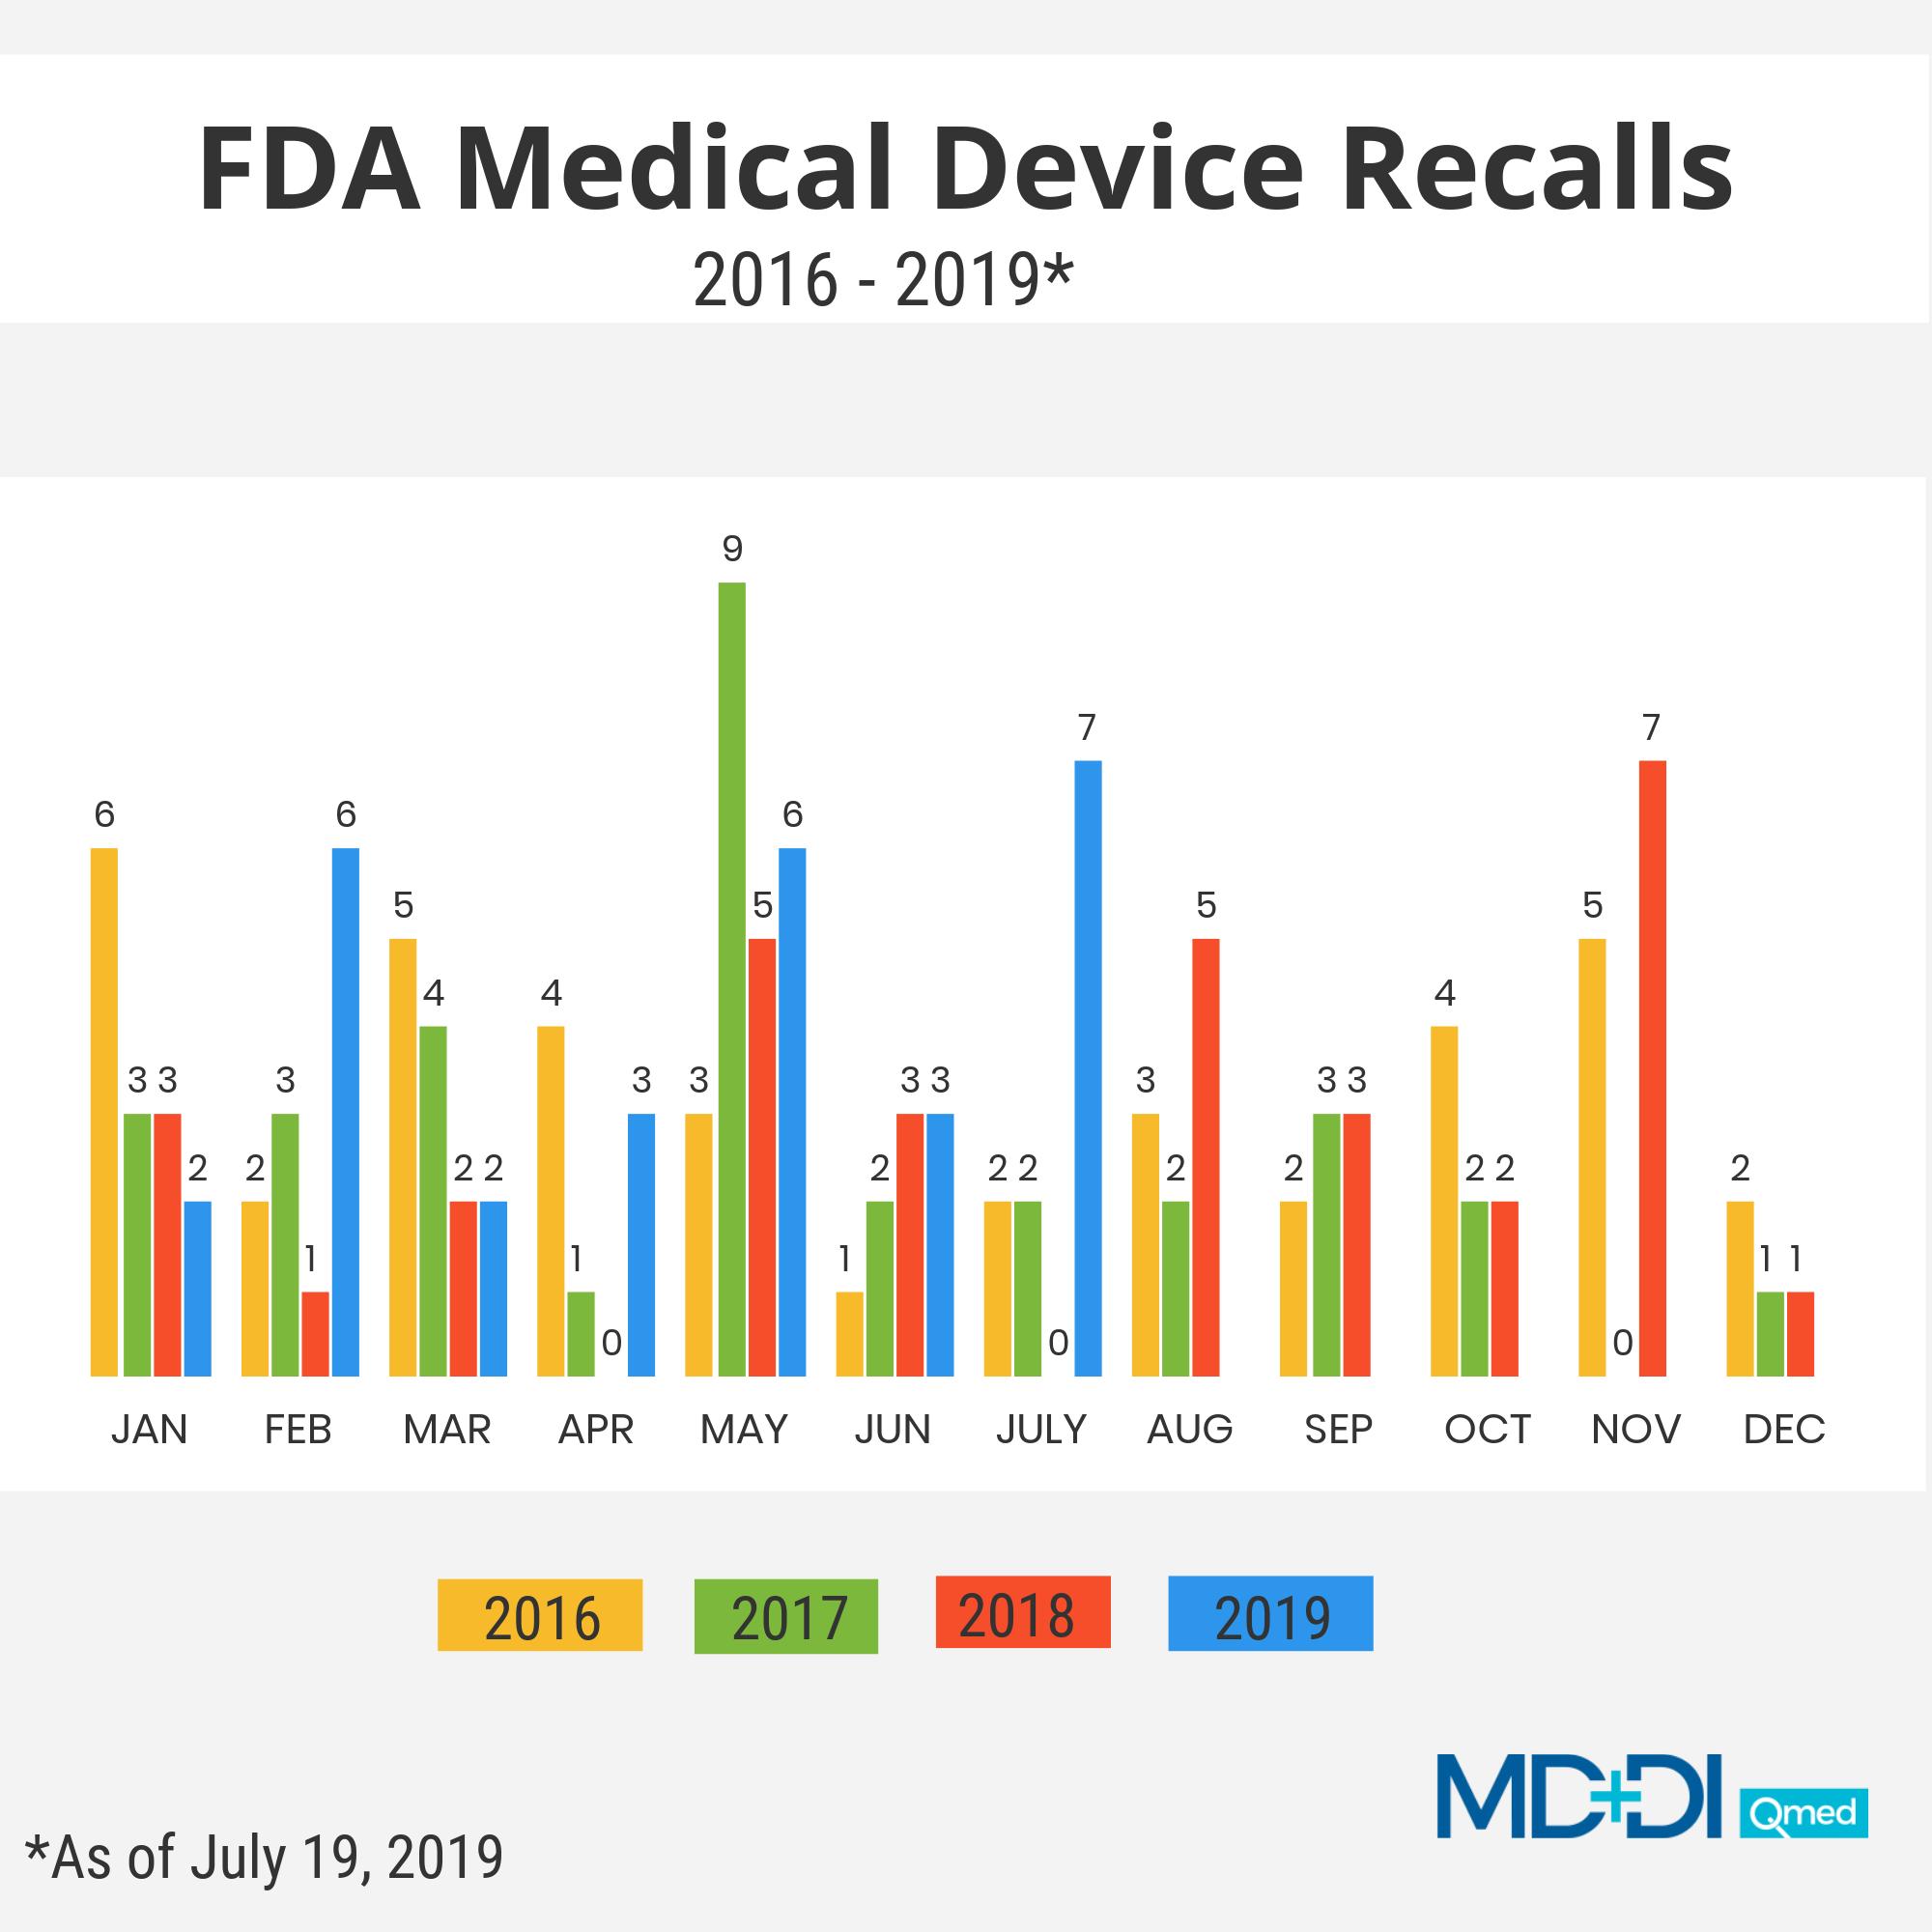 FDA medical device recalls